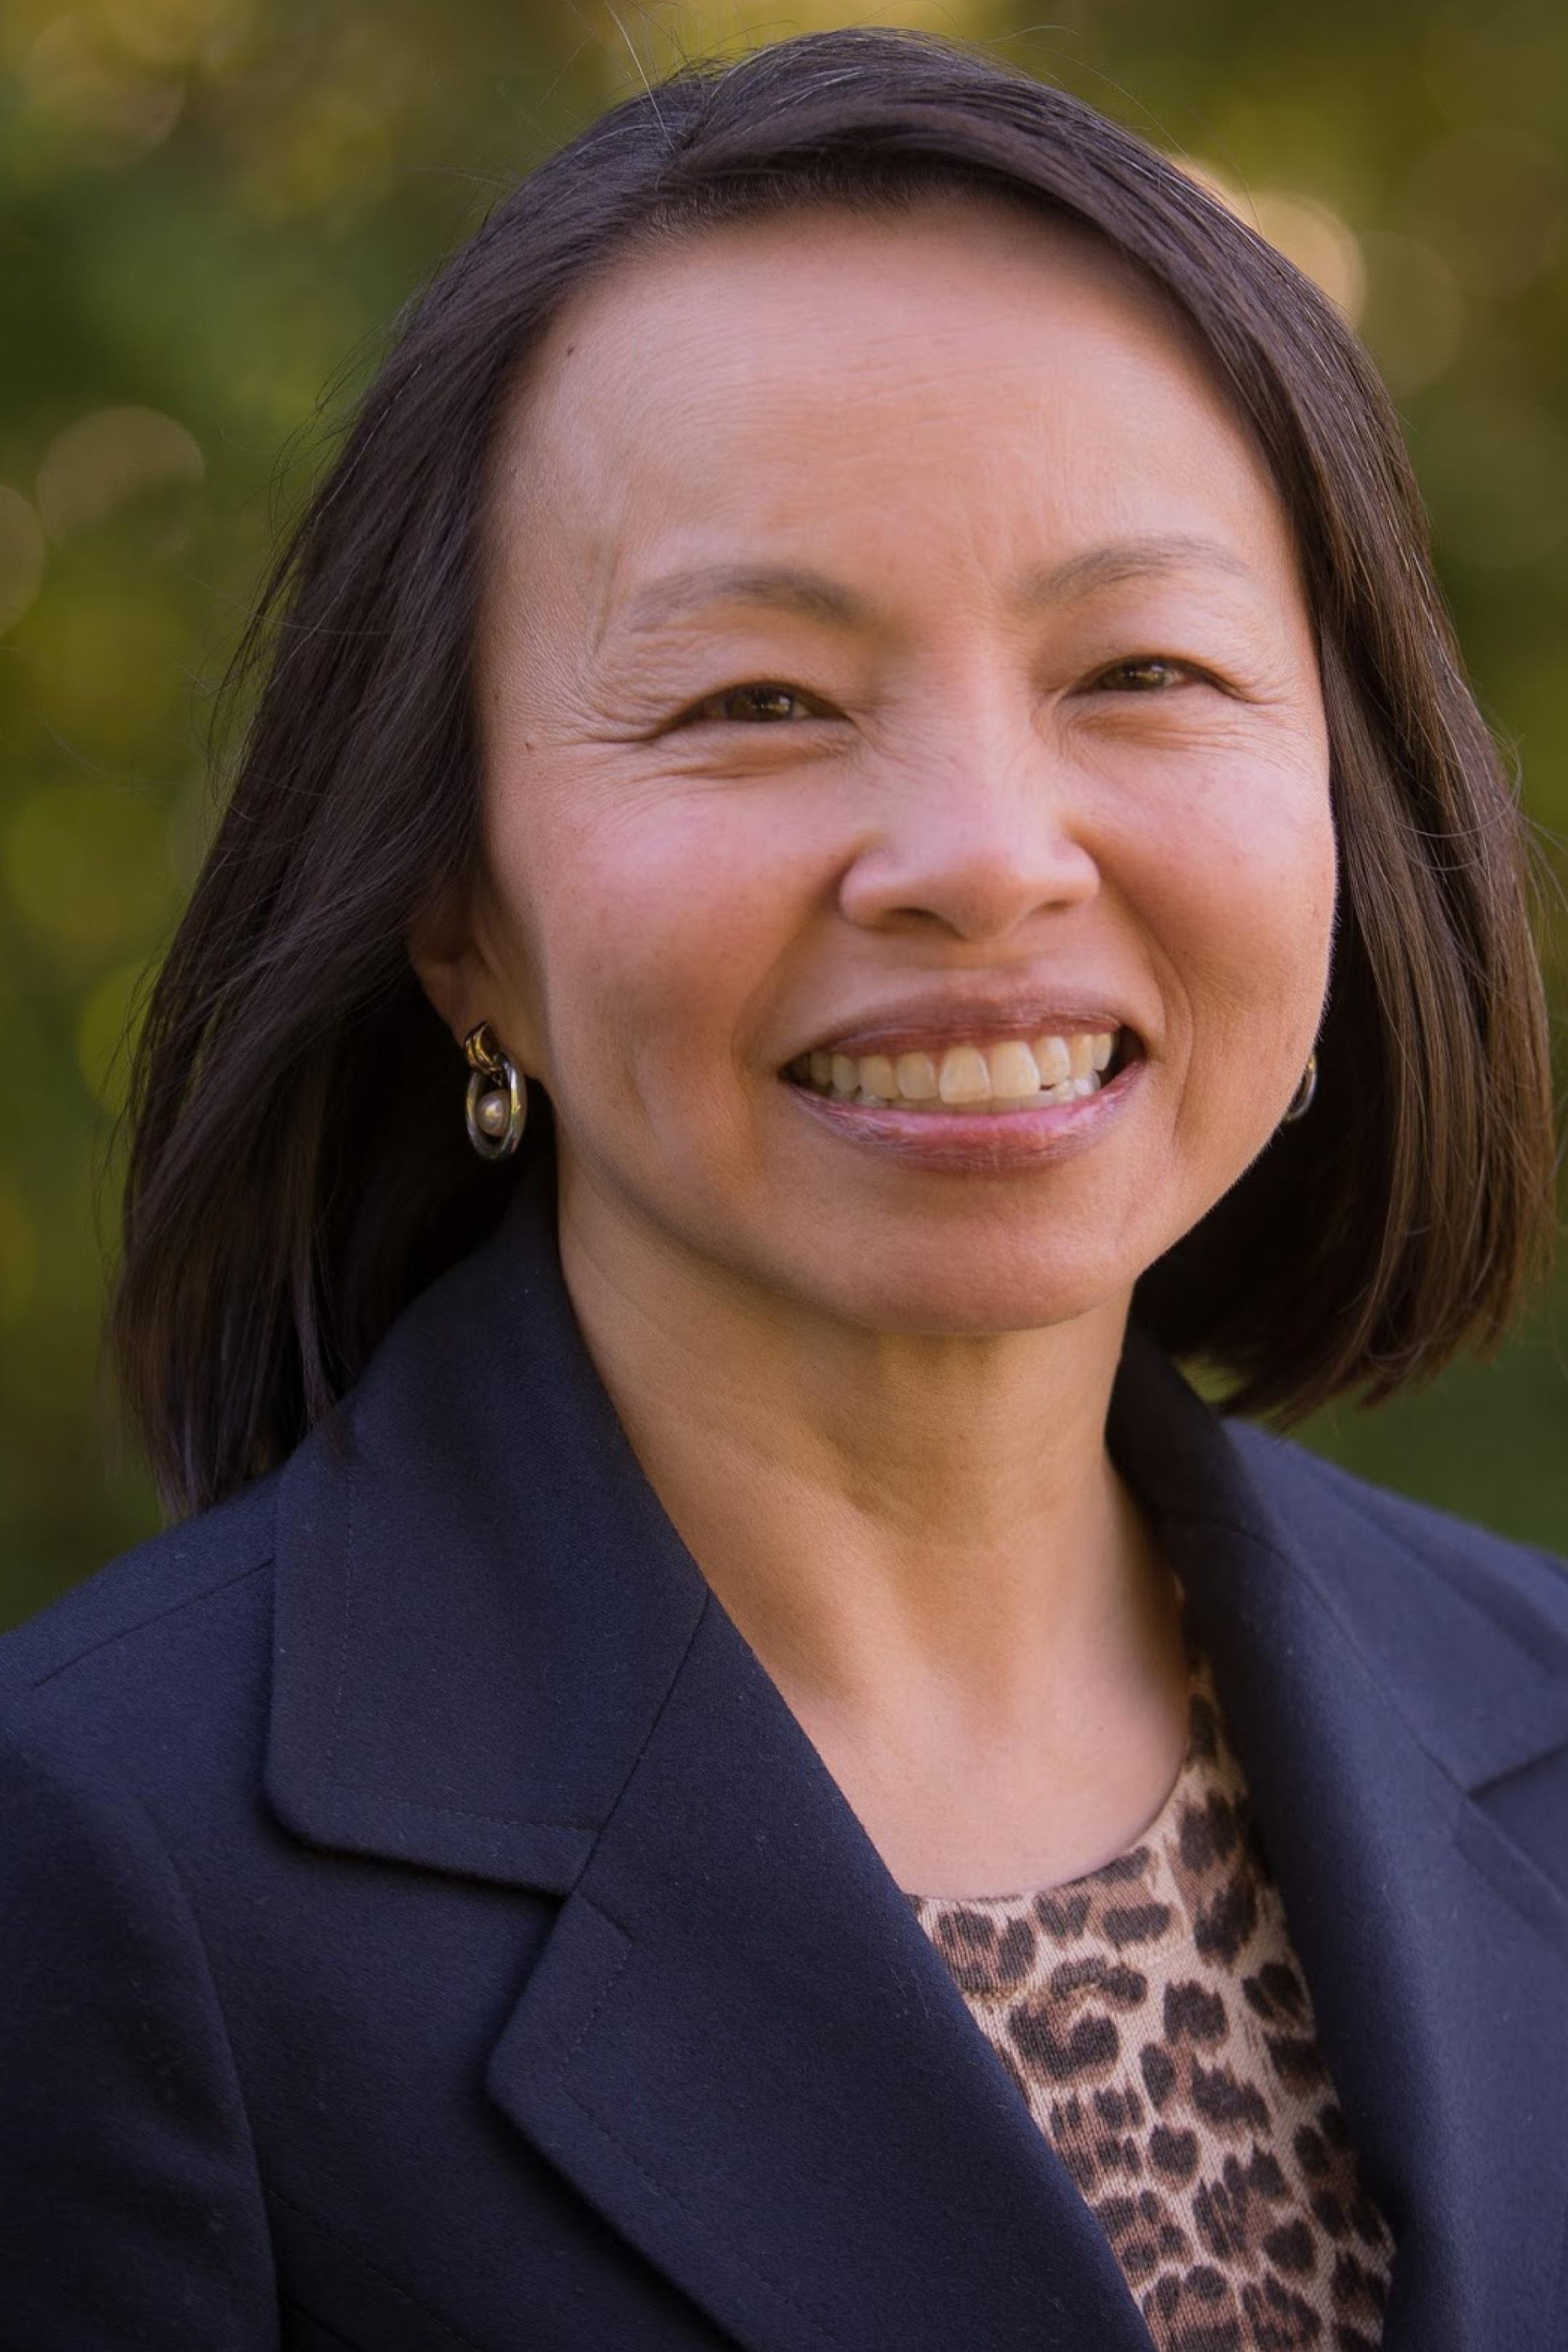 Susan Chang - Shoreline City Council